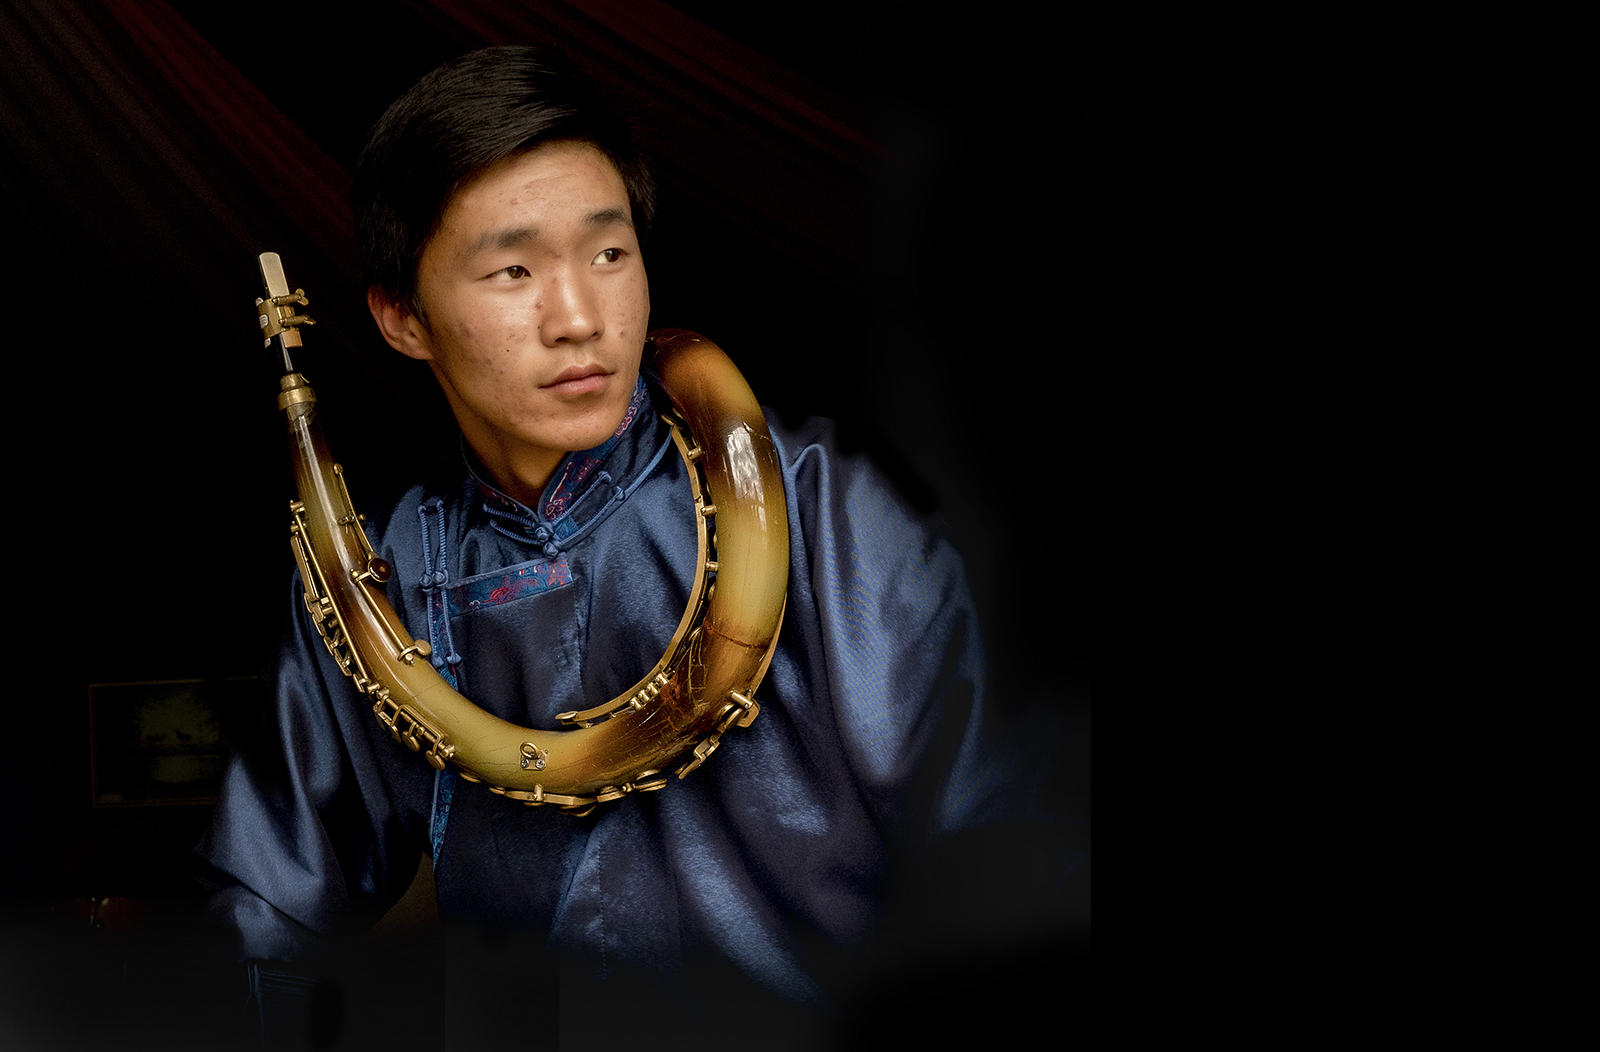 mongolian horn musician.jpg